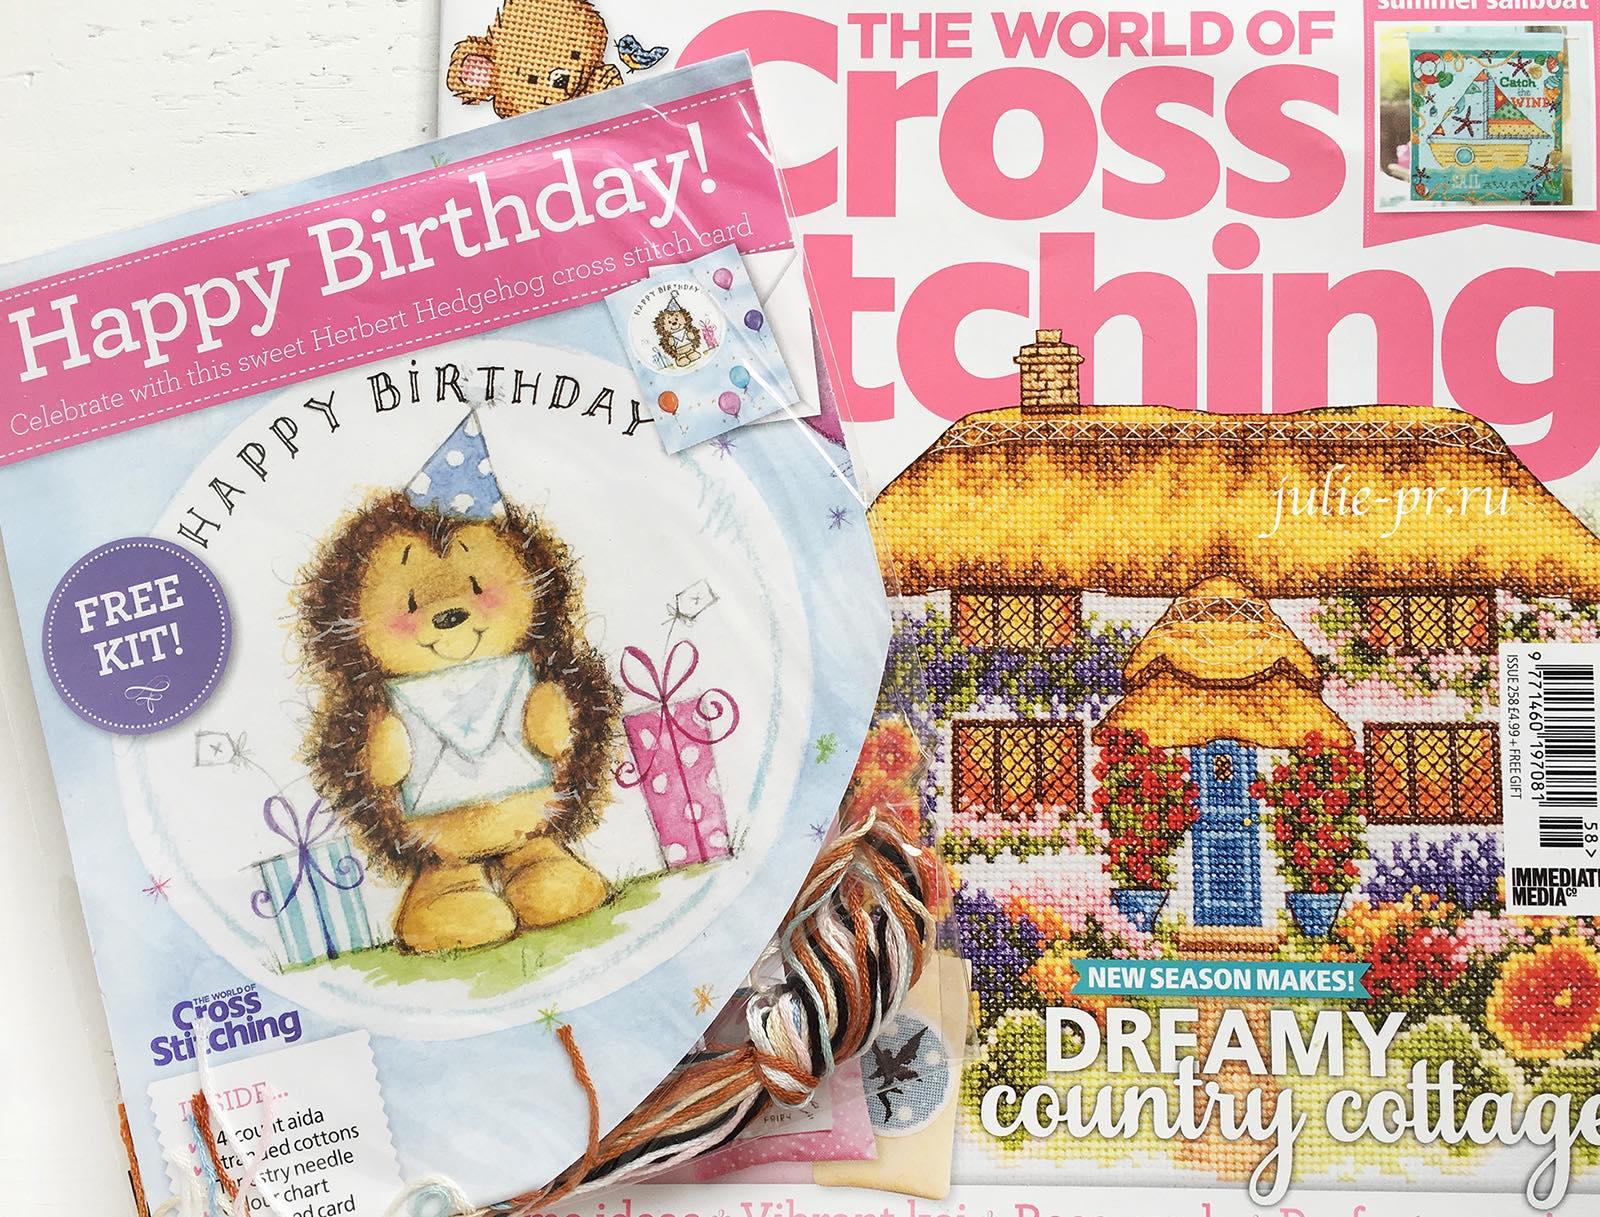 вышивка крестом, Herbert Hedgehog birthday card отJill Cooper, журналThe world of cross stitching (№258, сентябрь 2017)